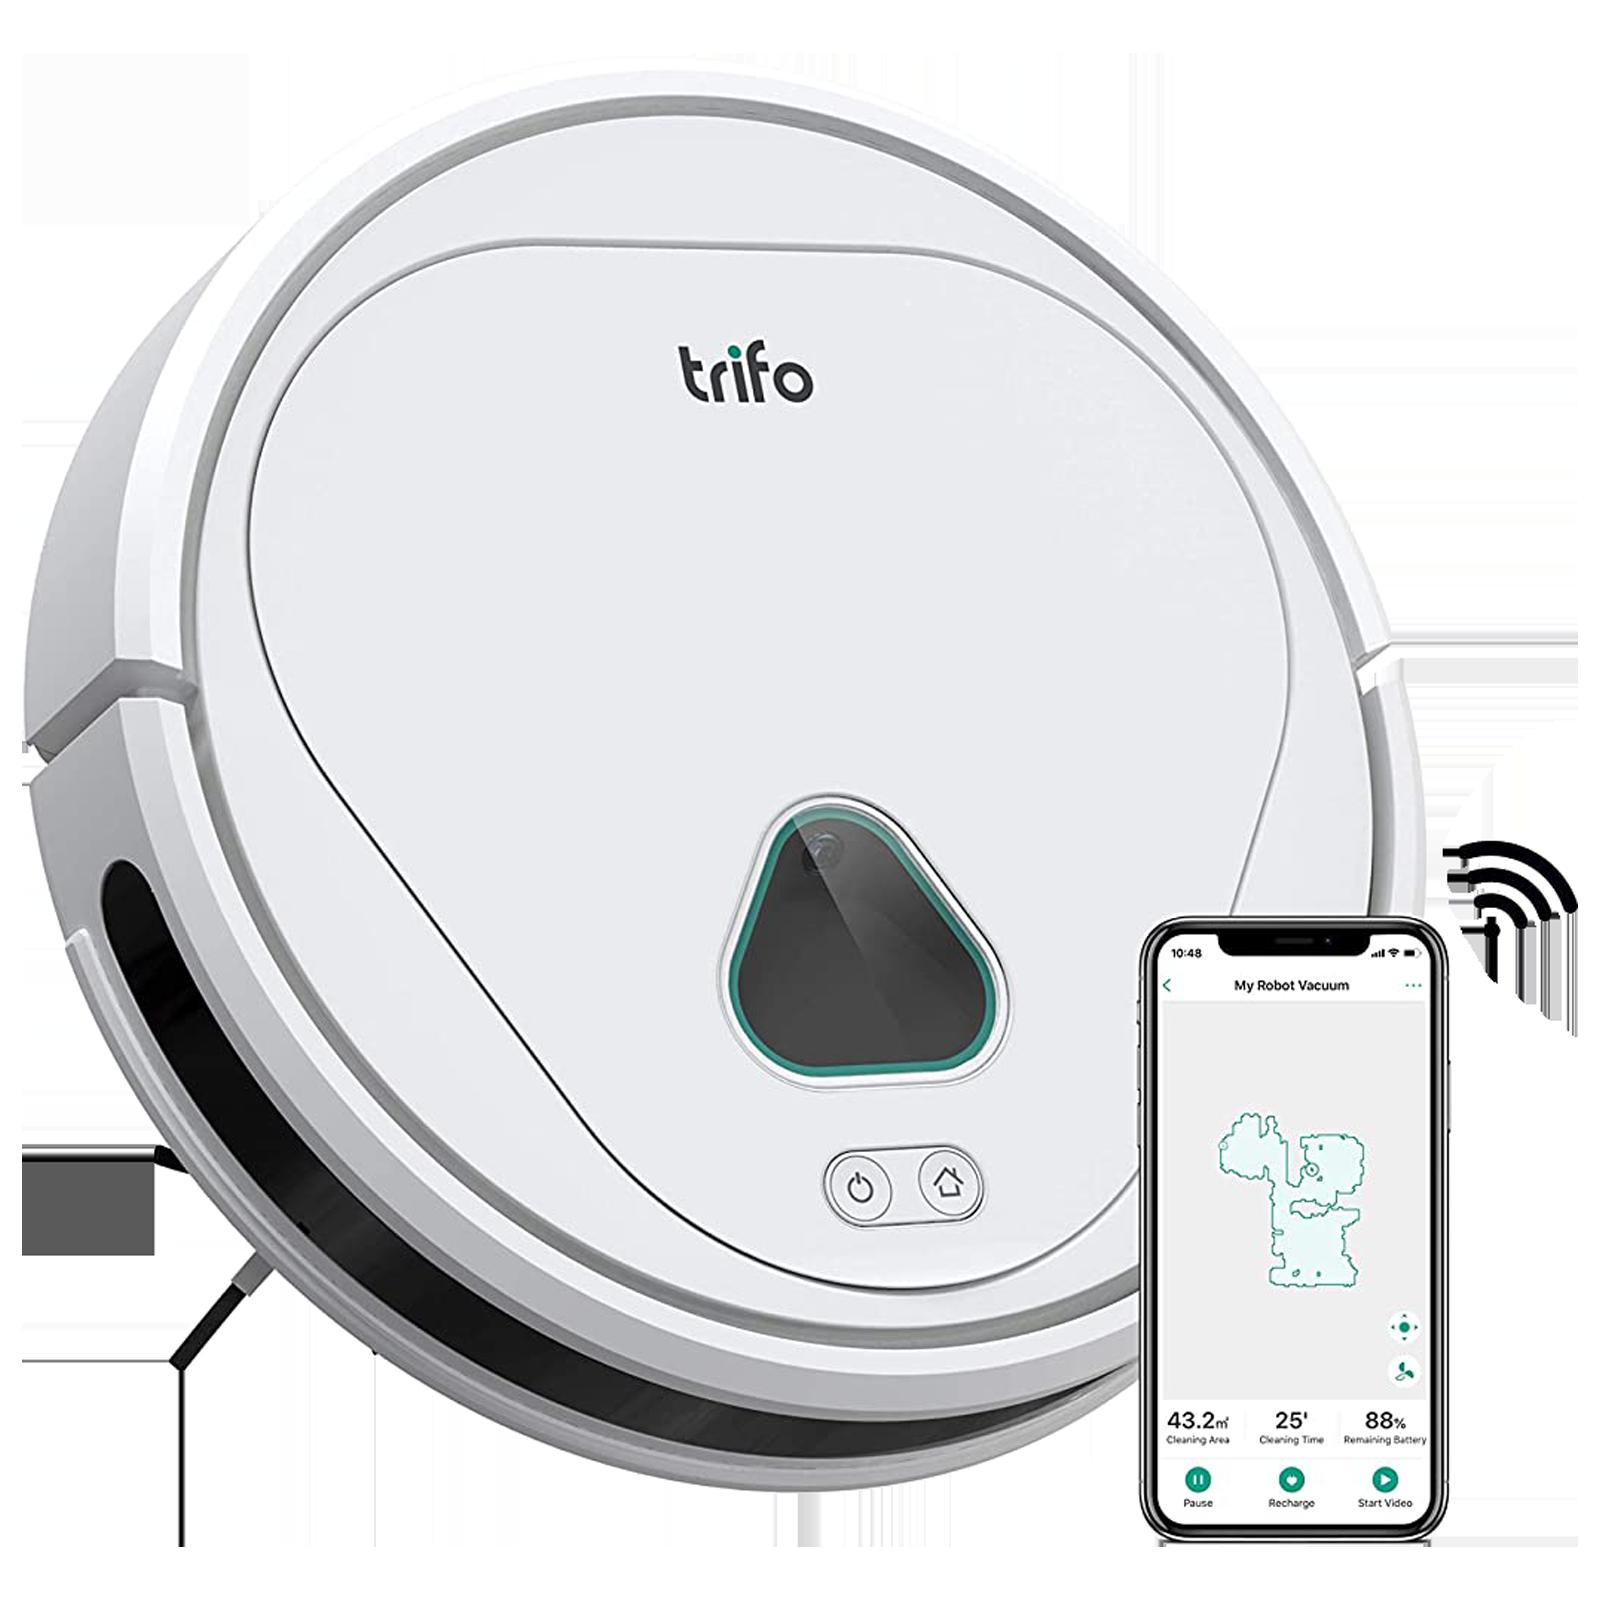 Trifo Max-P 40 Watts Robotic Vacuum Cleaner (0.6 Litres Tank, FBA73949, White)_1